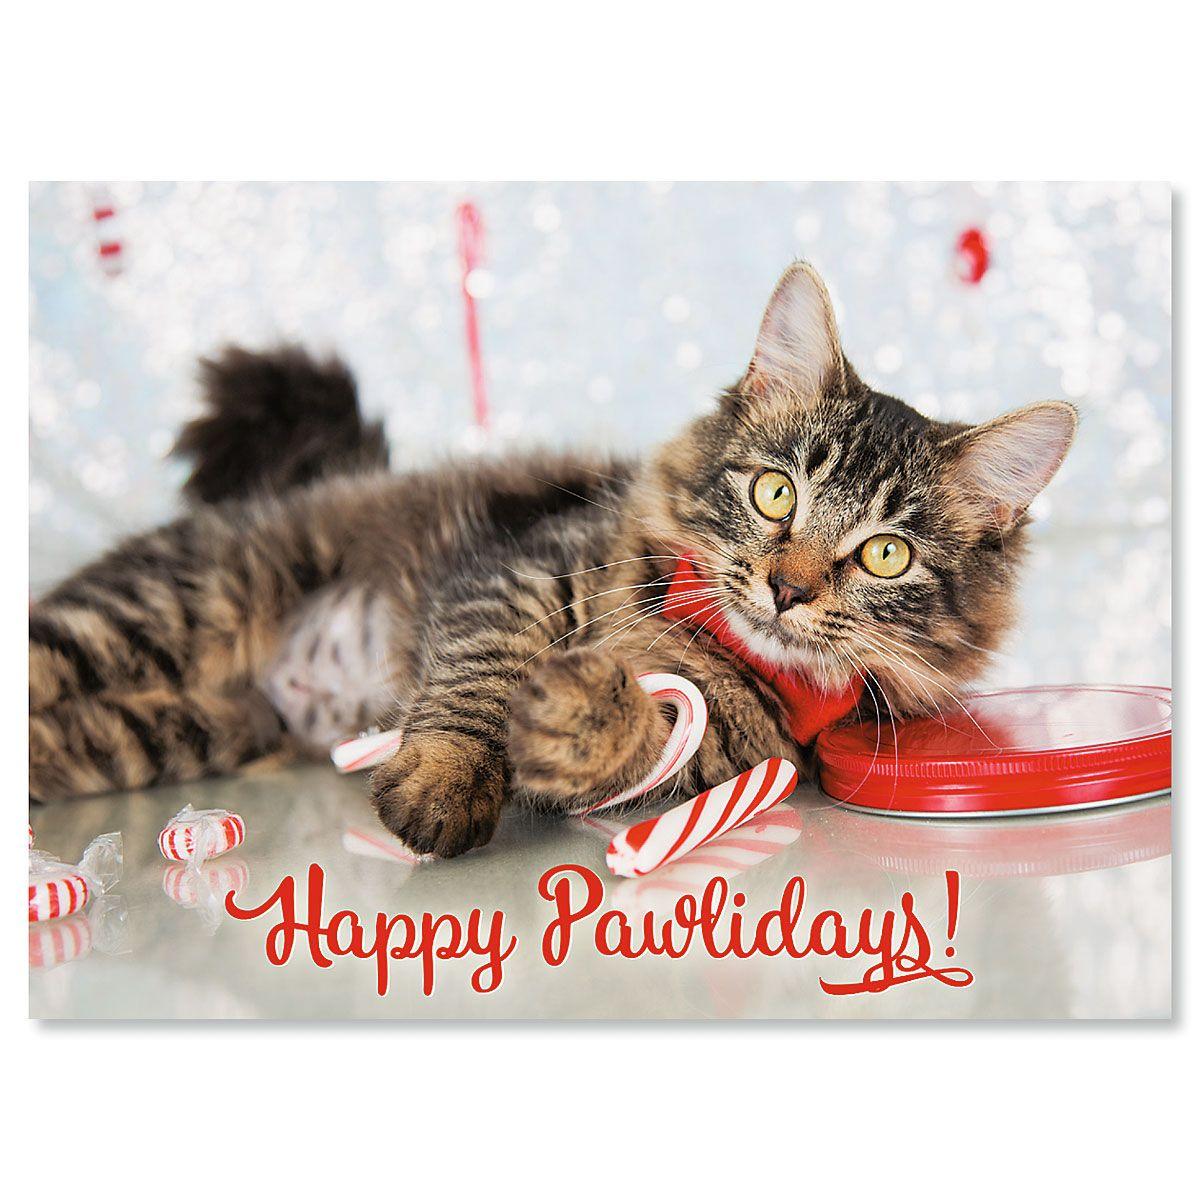 Happy Pawlidays Personalized Christmas Cards - Set of 18